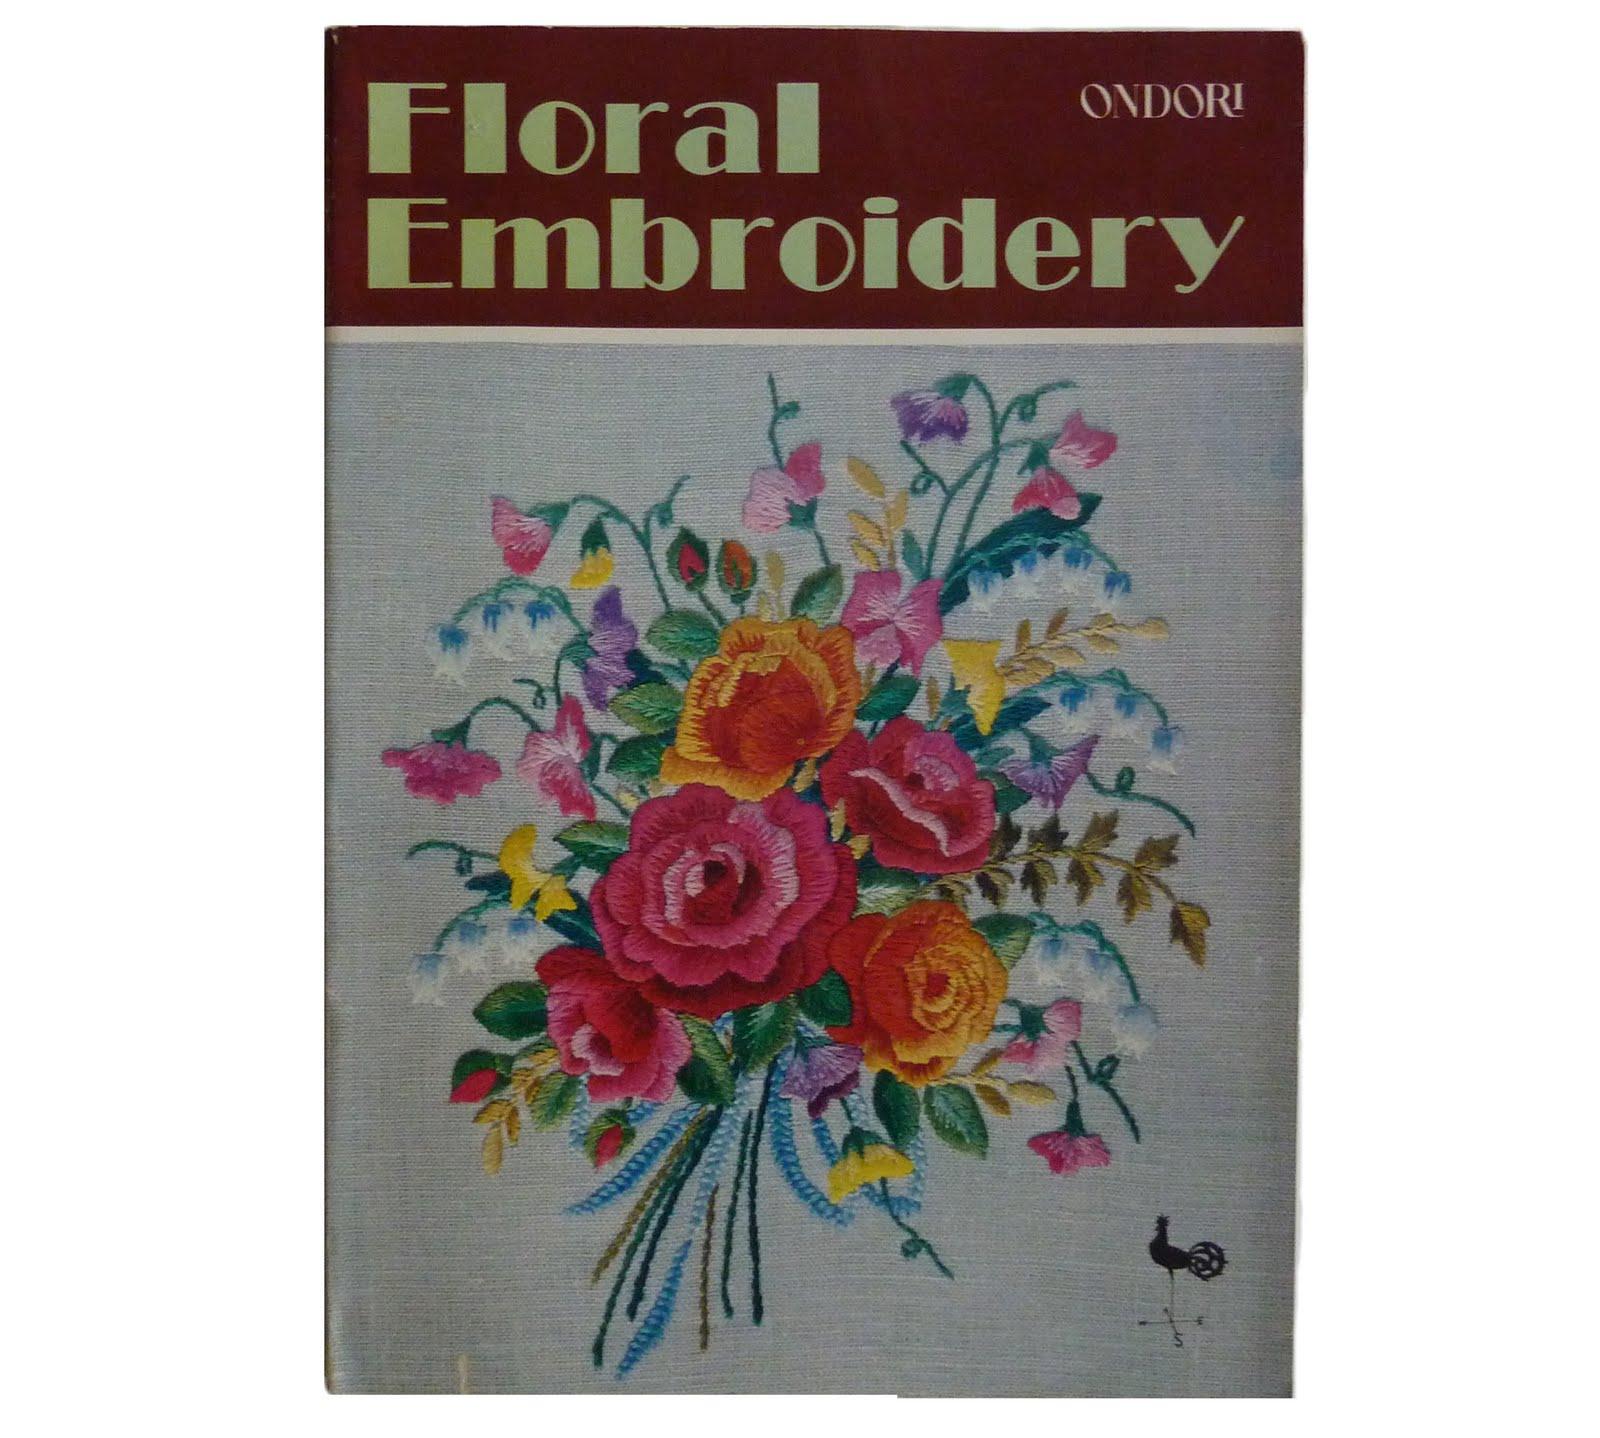 HAND EMBROIDERY BOOKS U00ab EMBROIDERY U0026 ORIGAMI